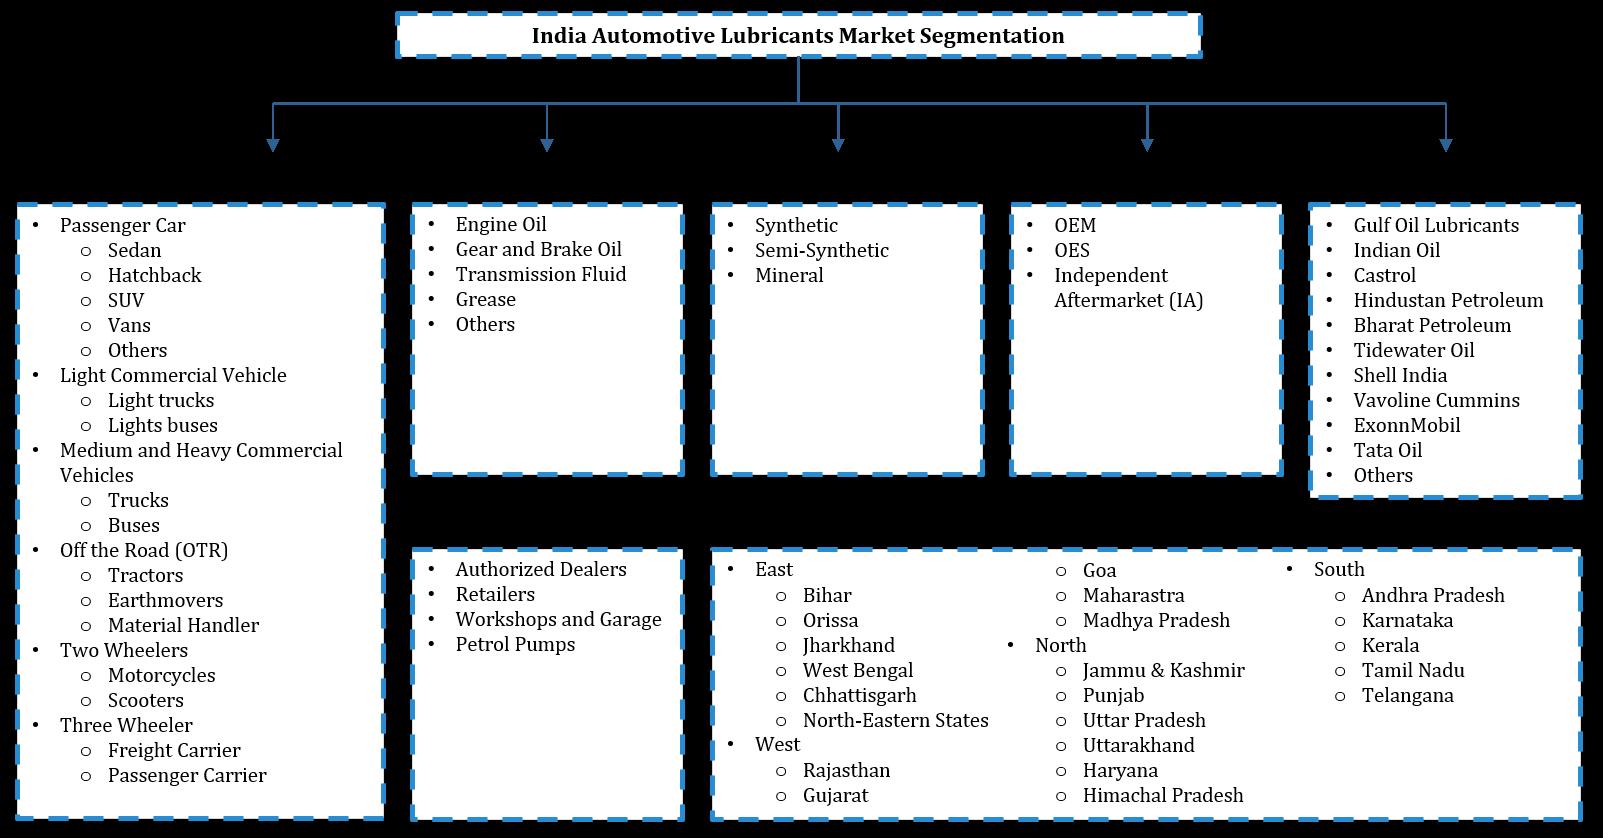 India Automotive Lubricants Market Segmentation